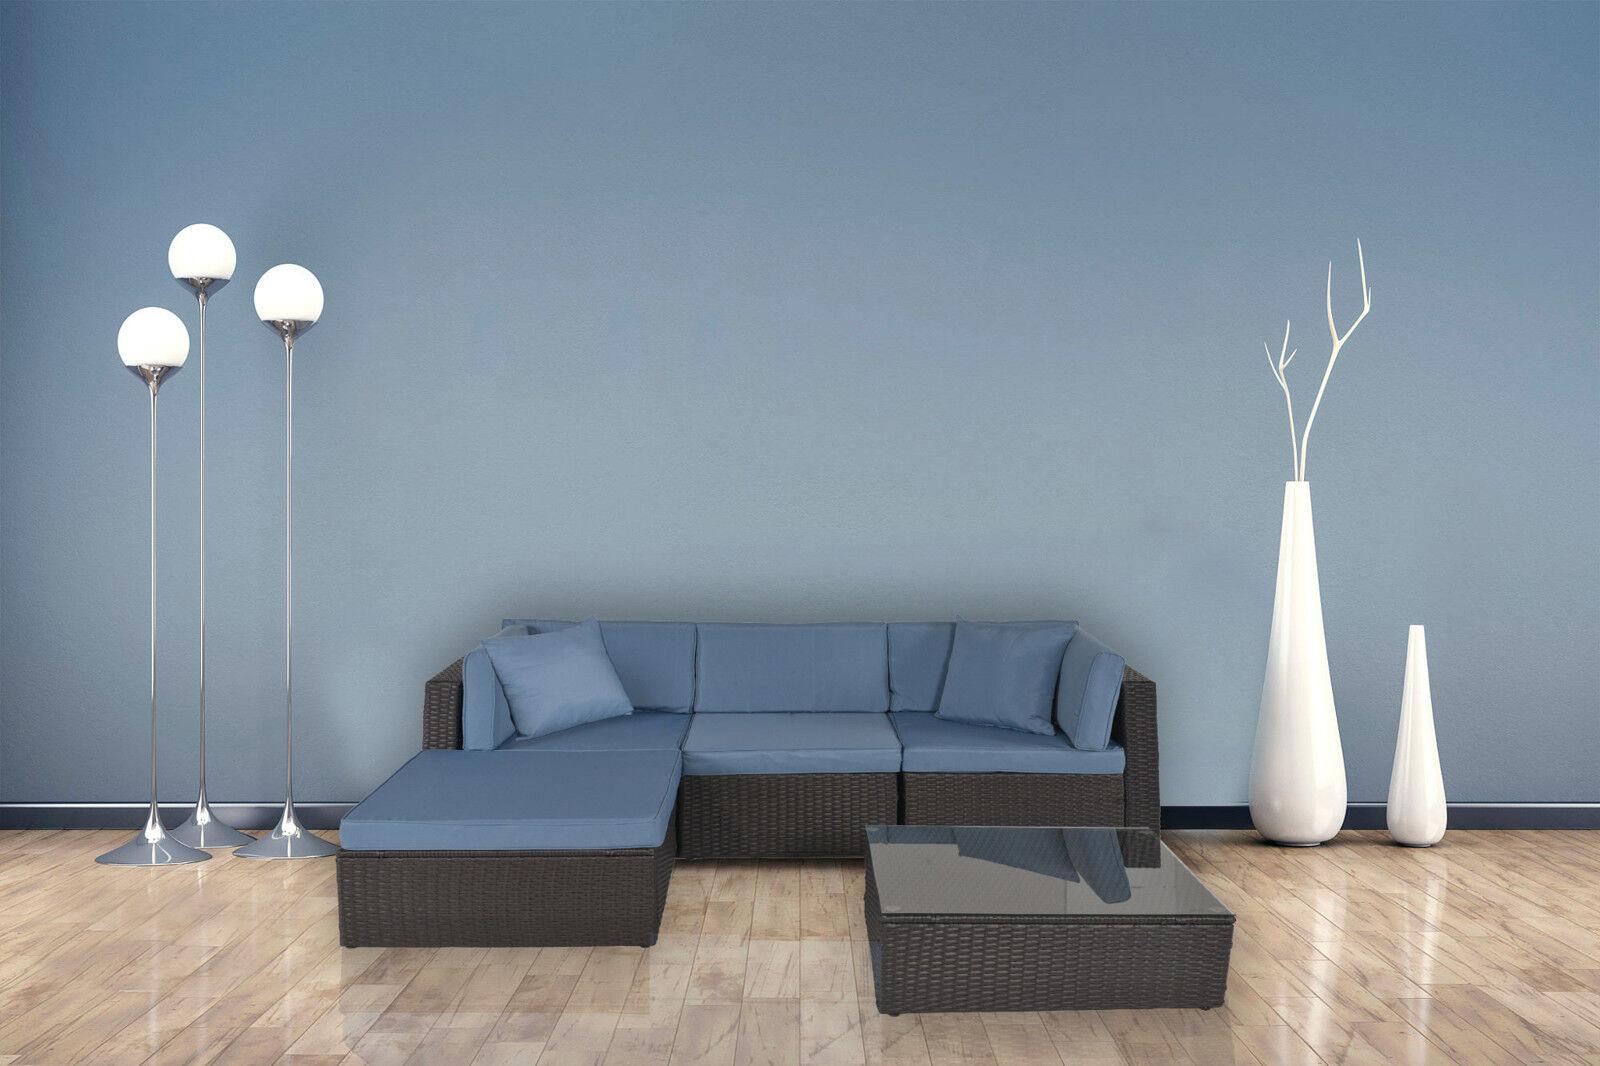 Garden Furniture - Patio Furniture Sectional Sofa Set Outdoor Rattan PE Wicker Large Cushioned Seat